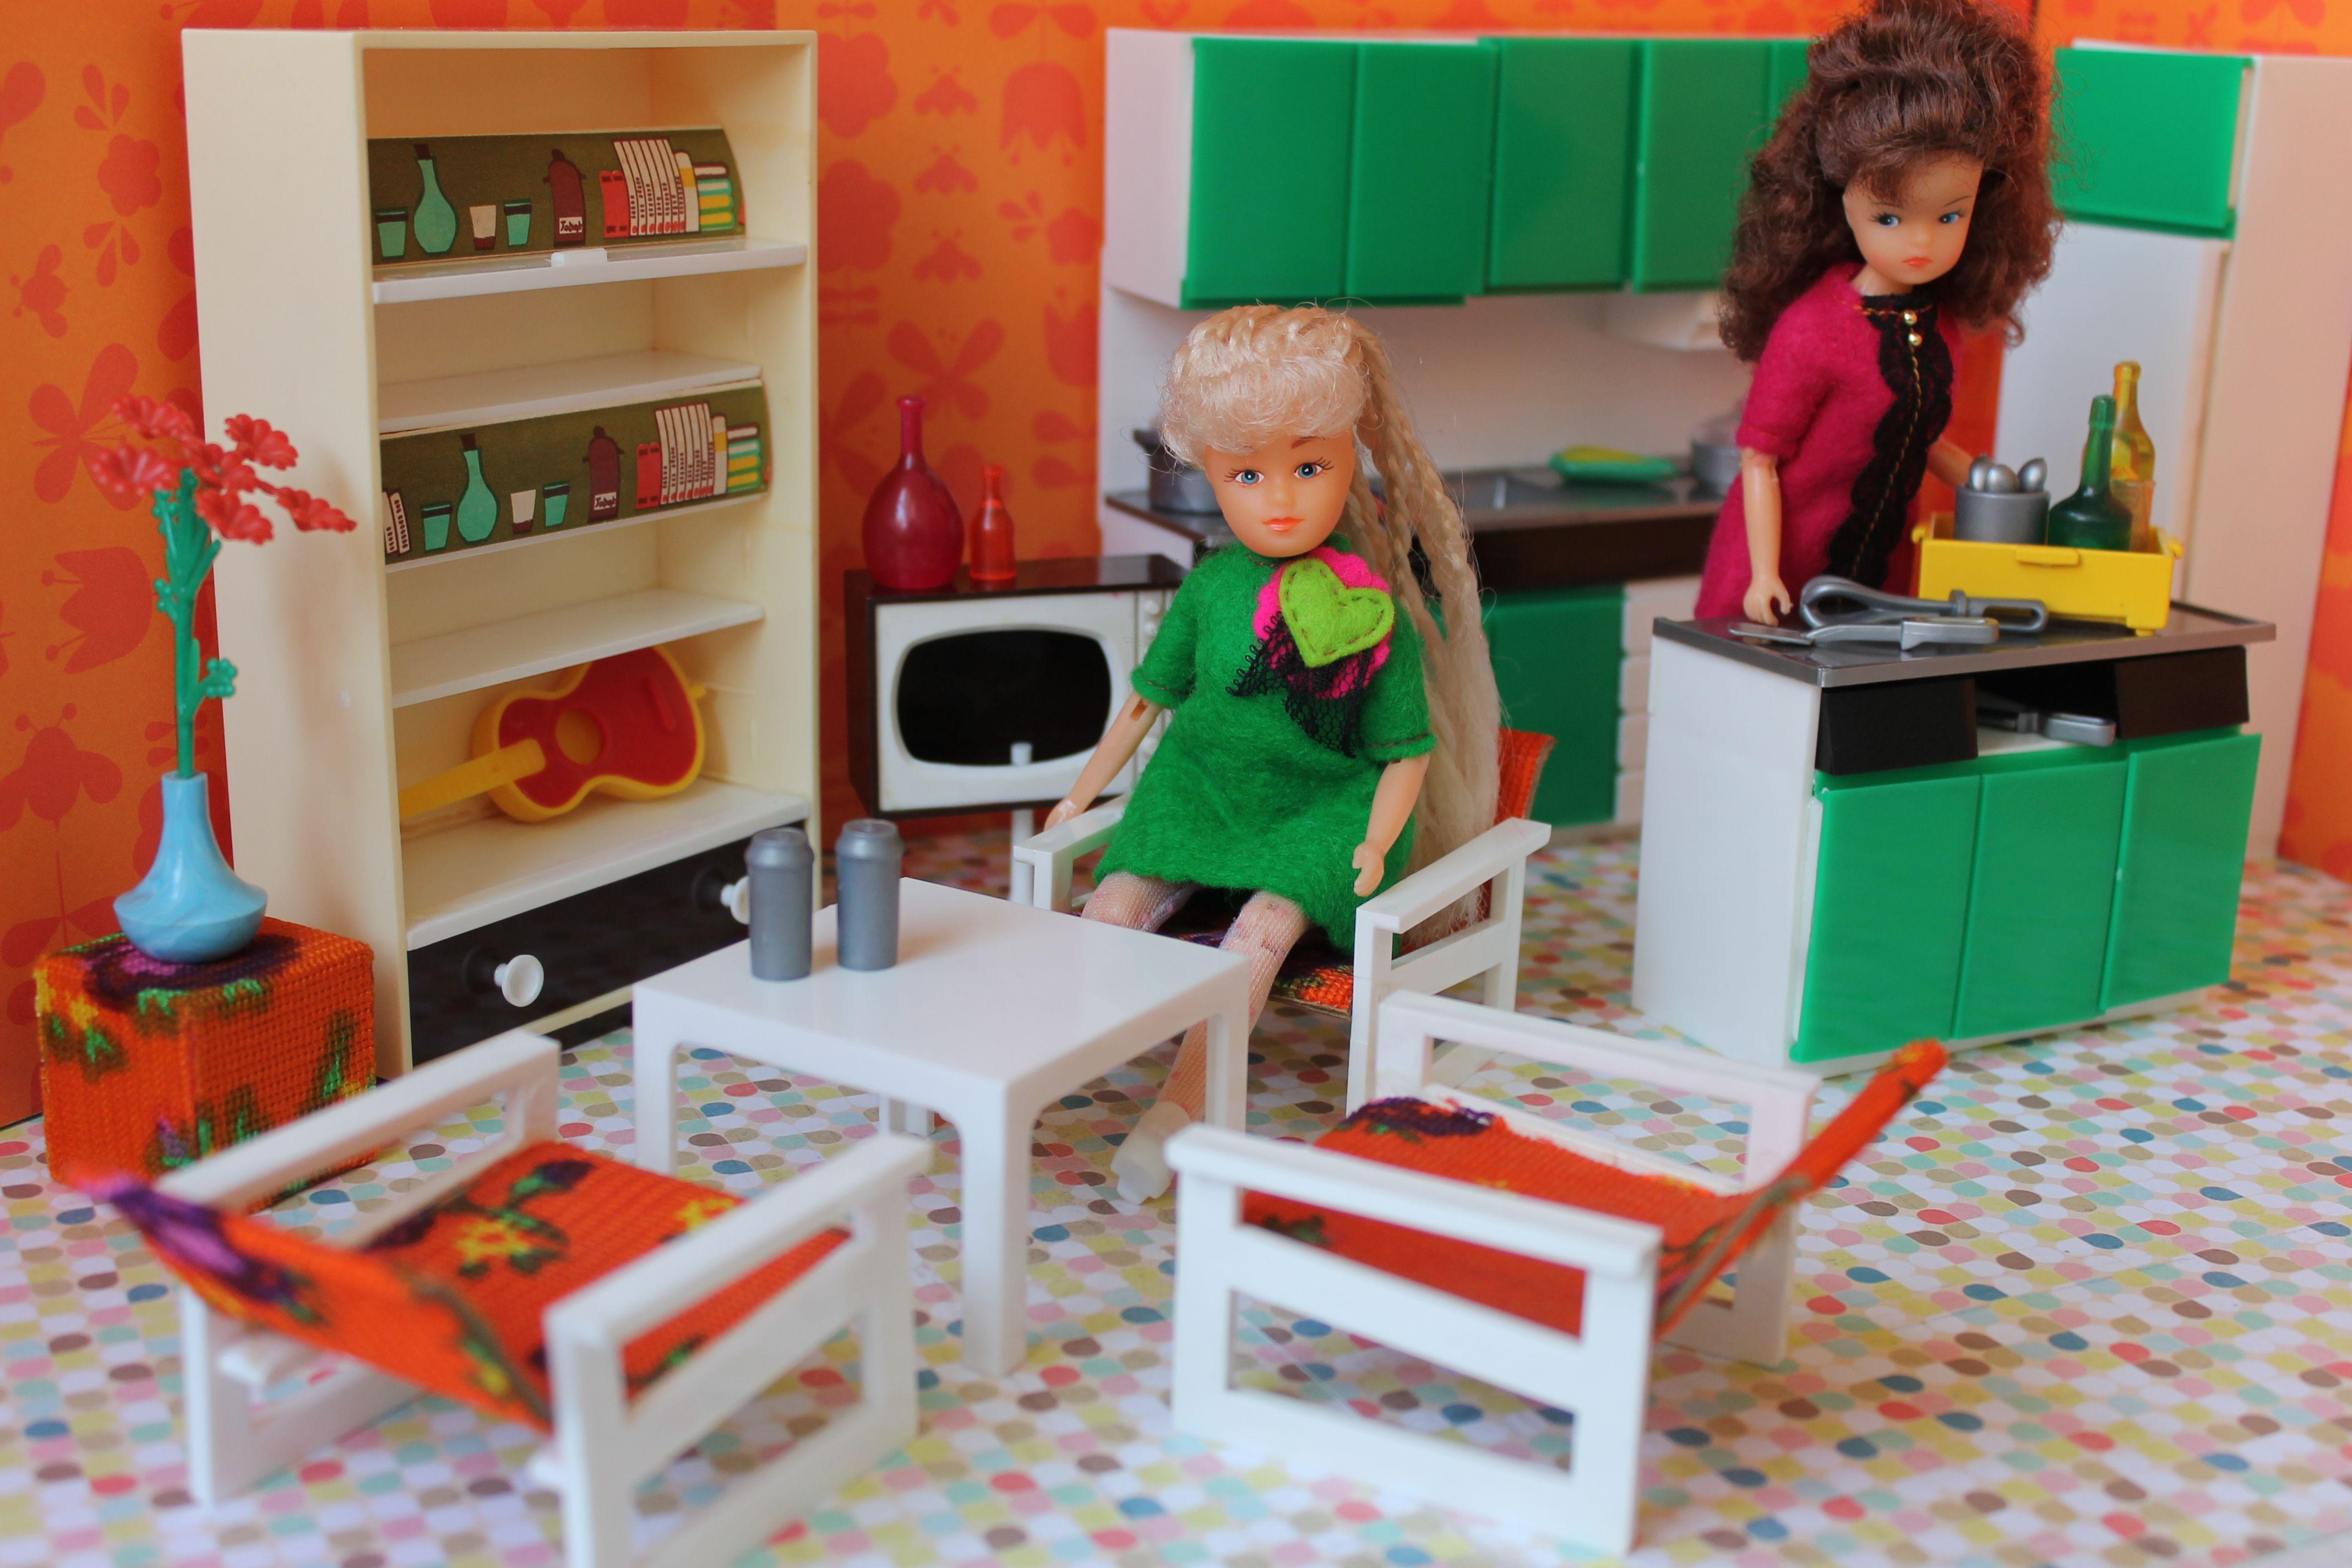 Vero DDR dollhouse furniture Vero DDR dollhouse